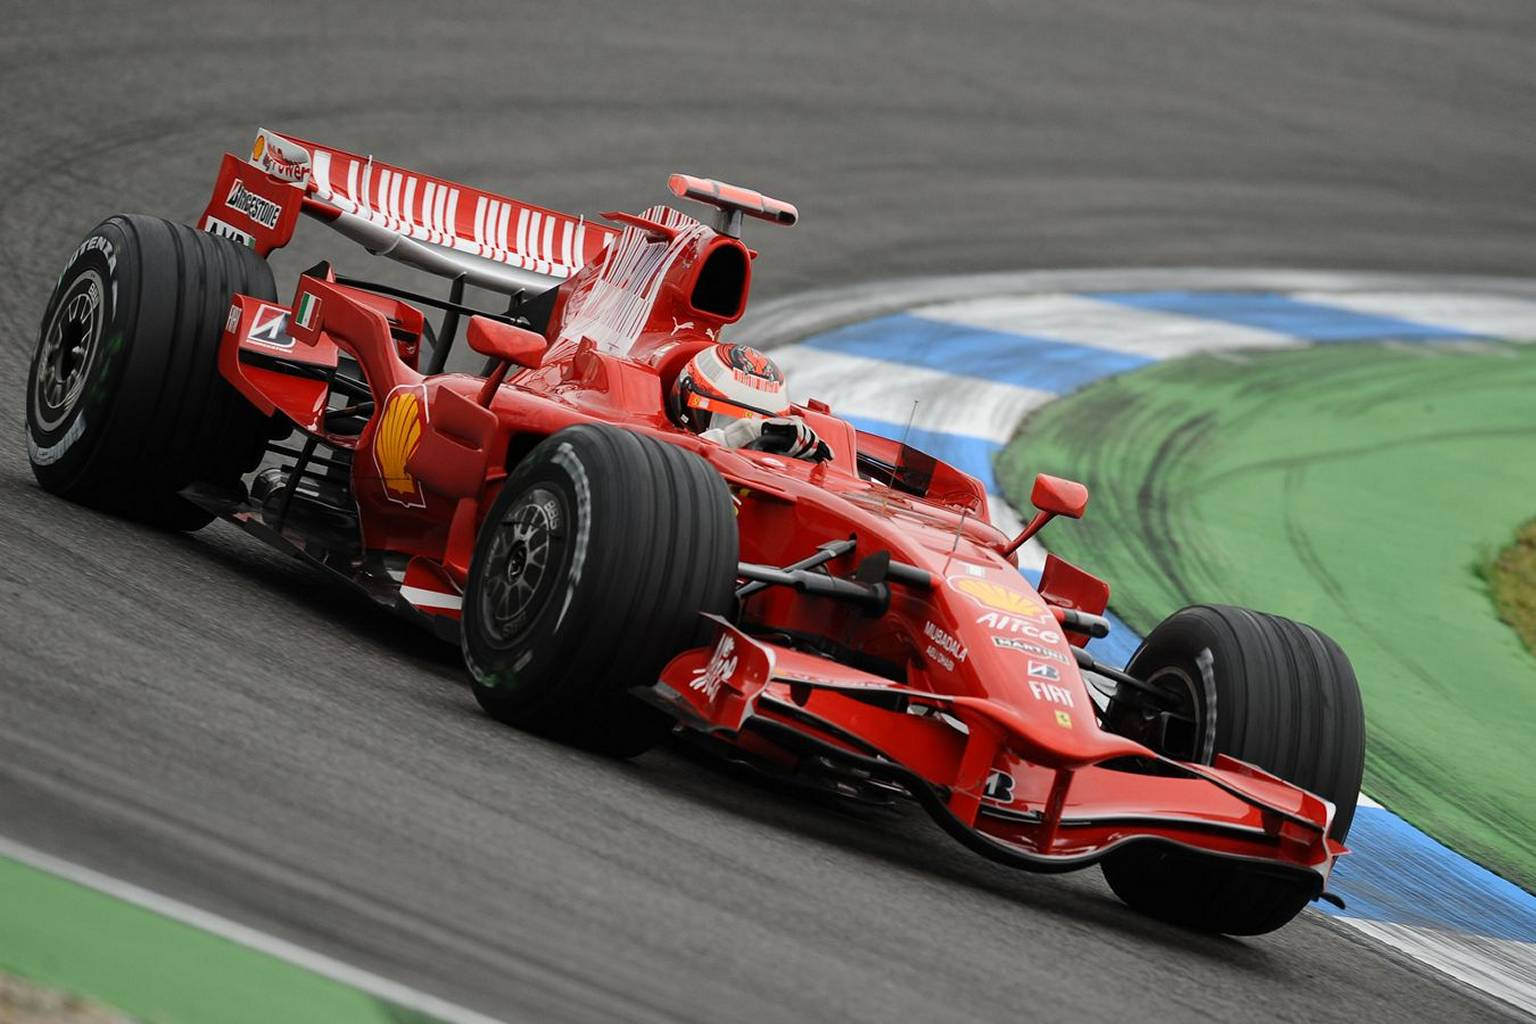 https://formula1.files.wordpress.com/2008/07/race10_wallpapers_2_1280x1024.jpg